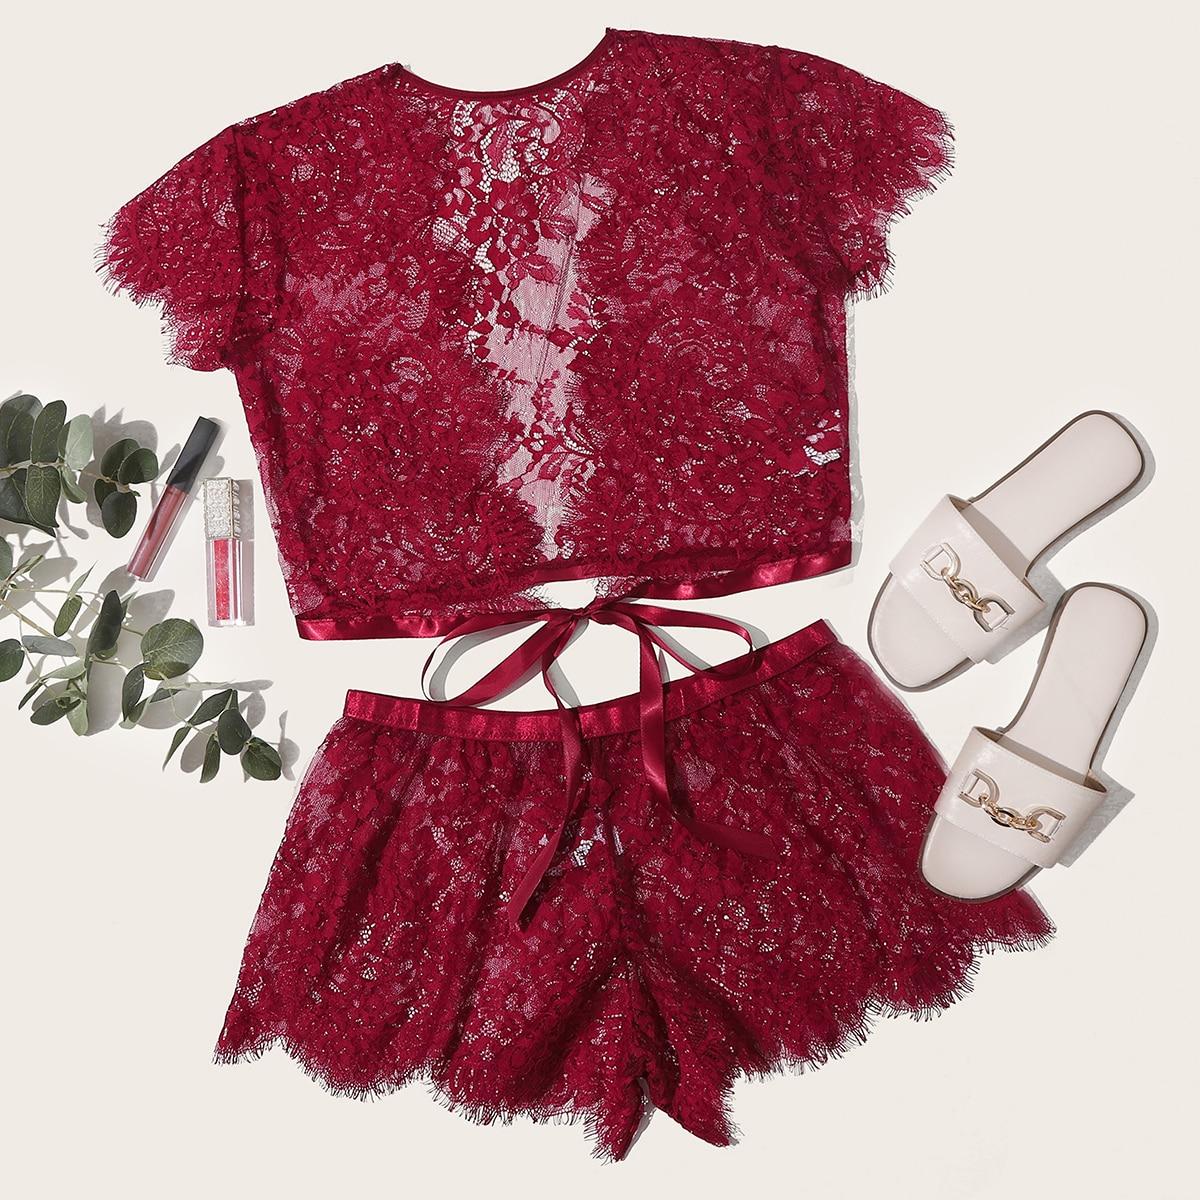 SHEIN / Eyelash Lace Scallop Trim Top With Shorts